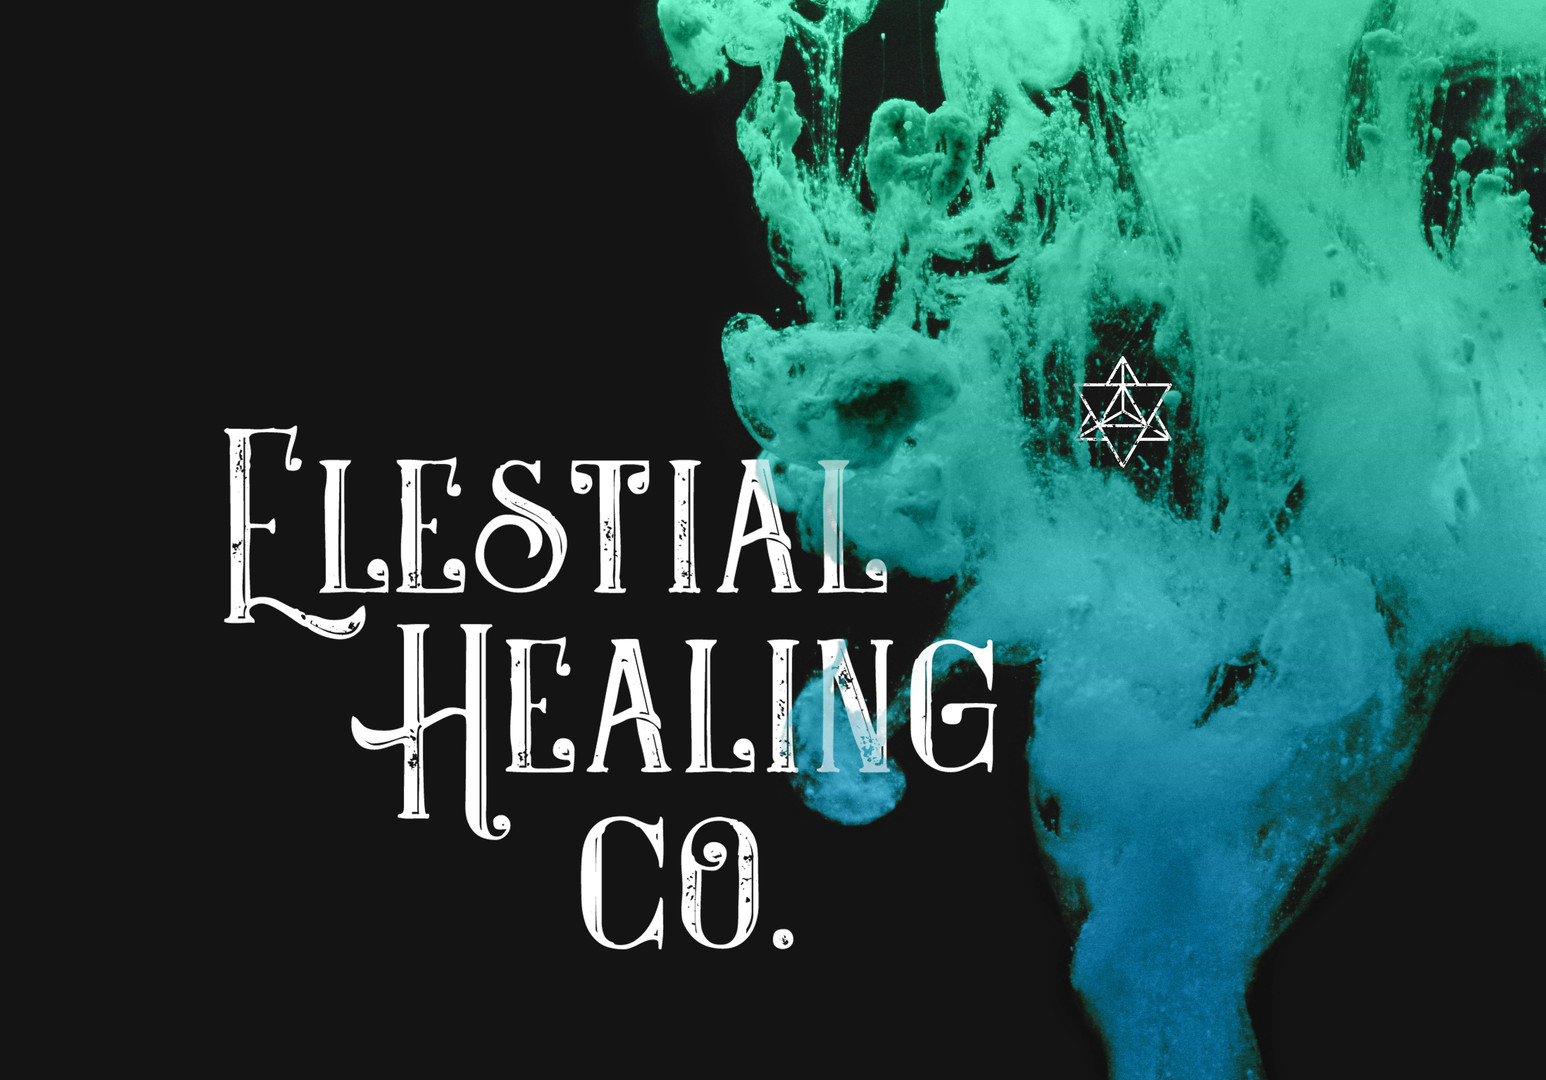 Elestial Healing Co. logo